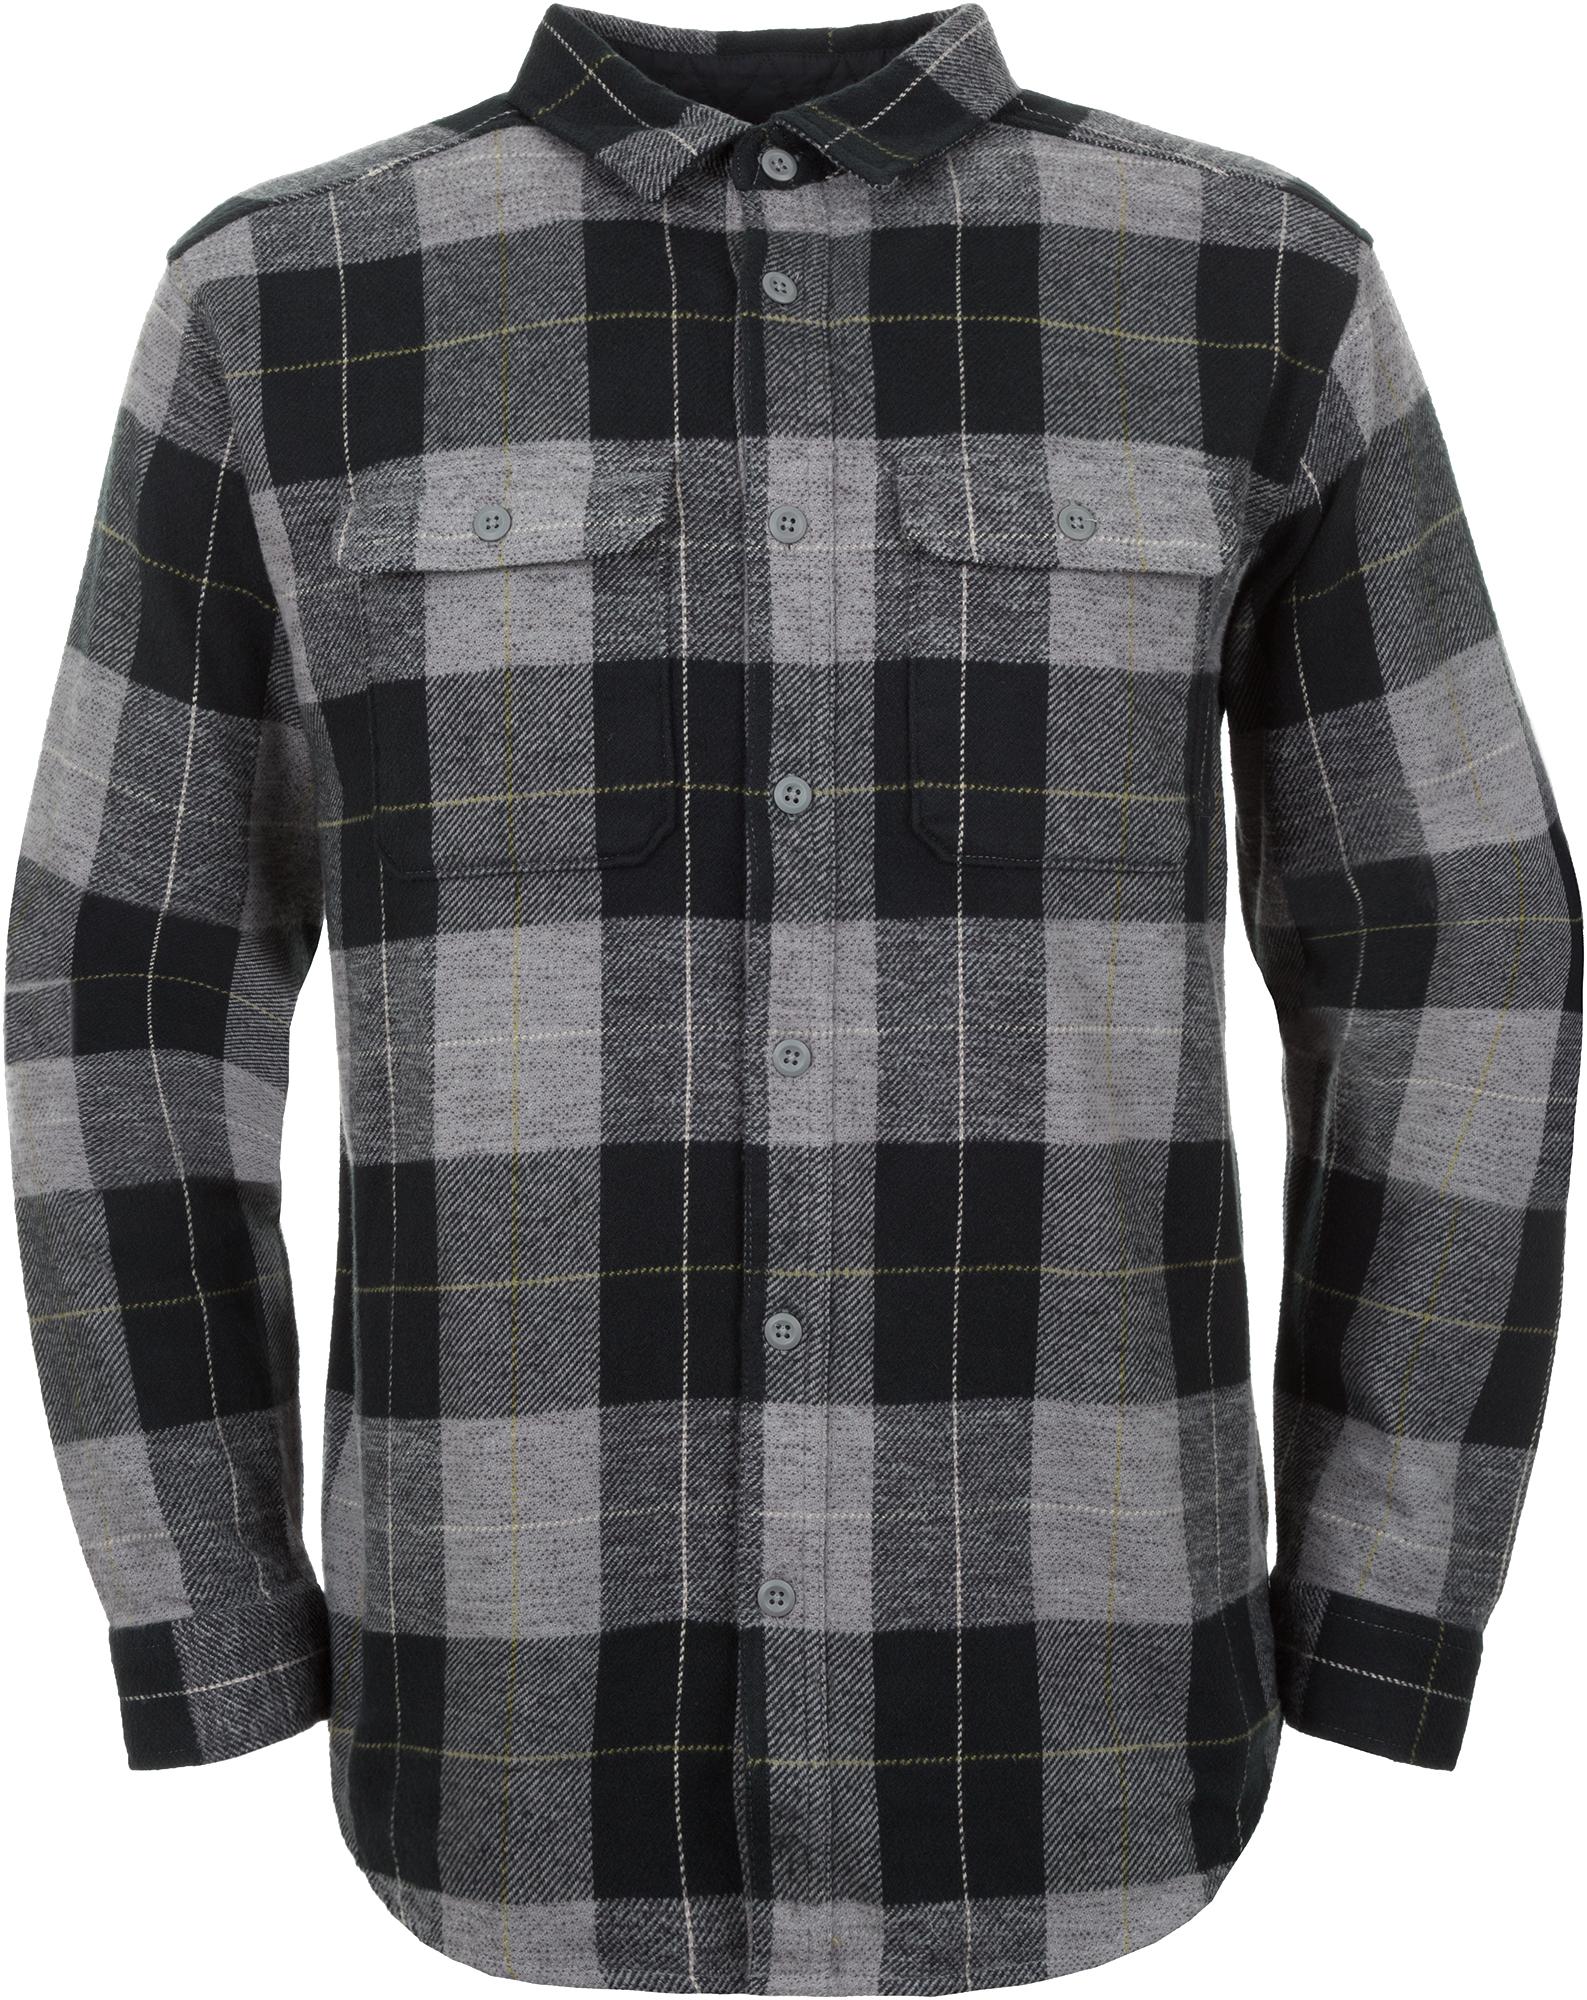 Mountain Hardwear Рубашка с длинным рукавом мужская Mountain Hardwear Walcott, размер 50